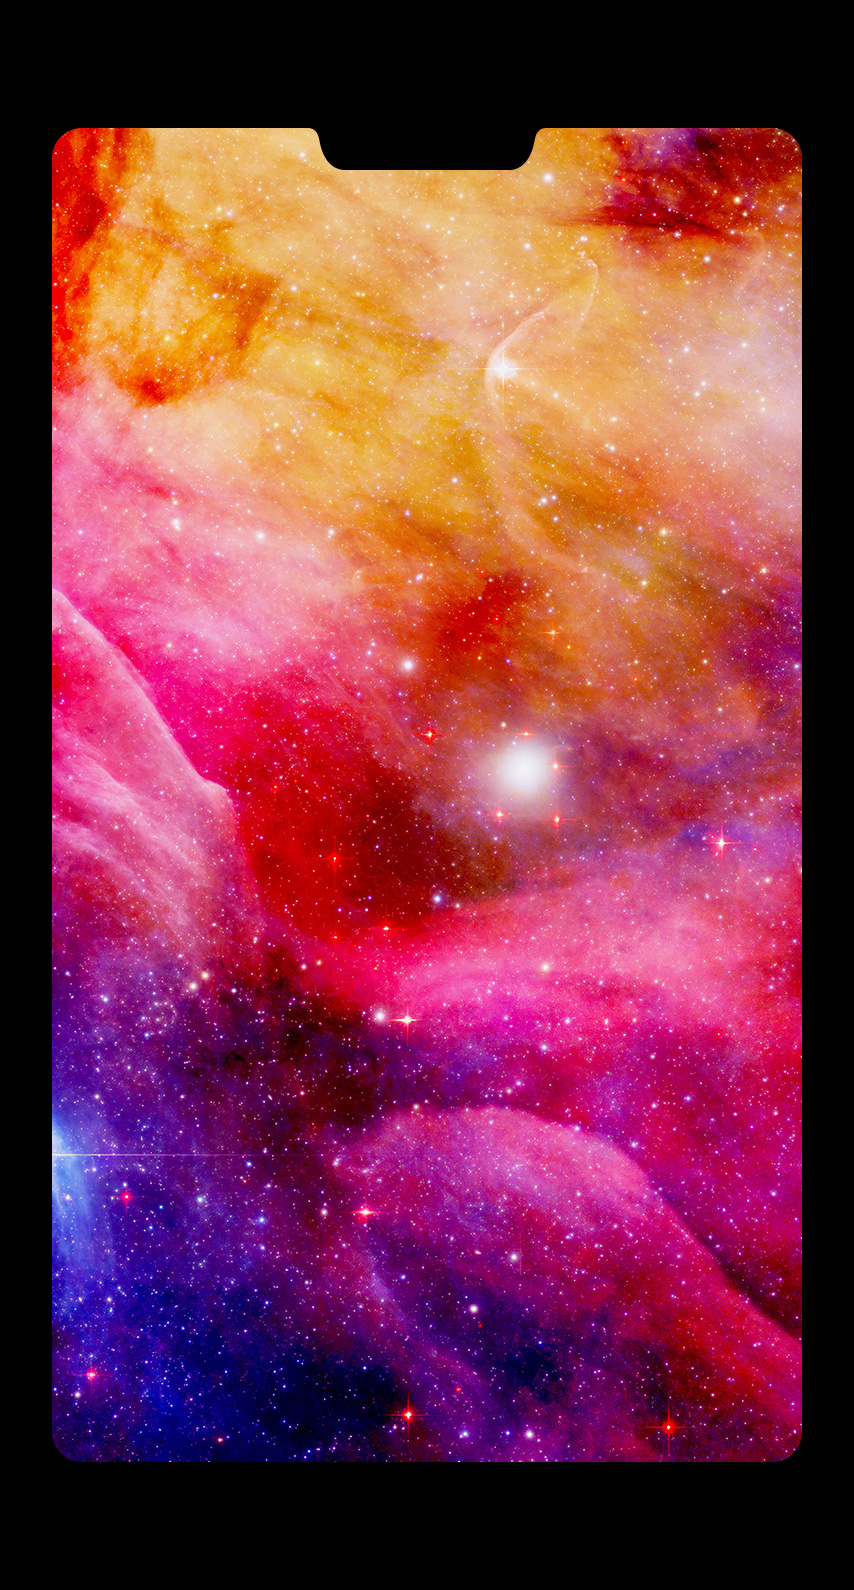 space, stars